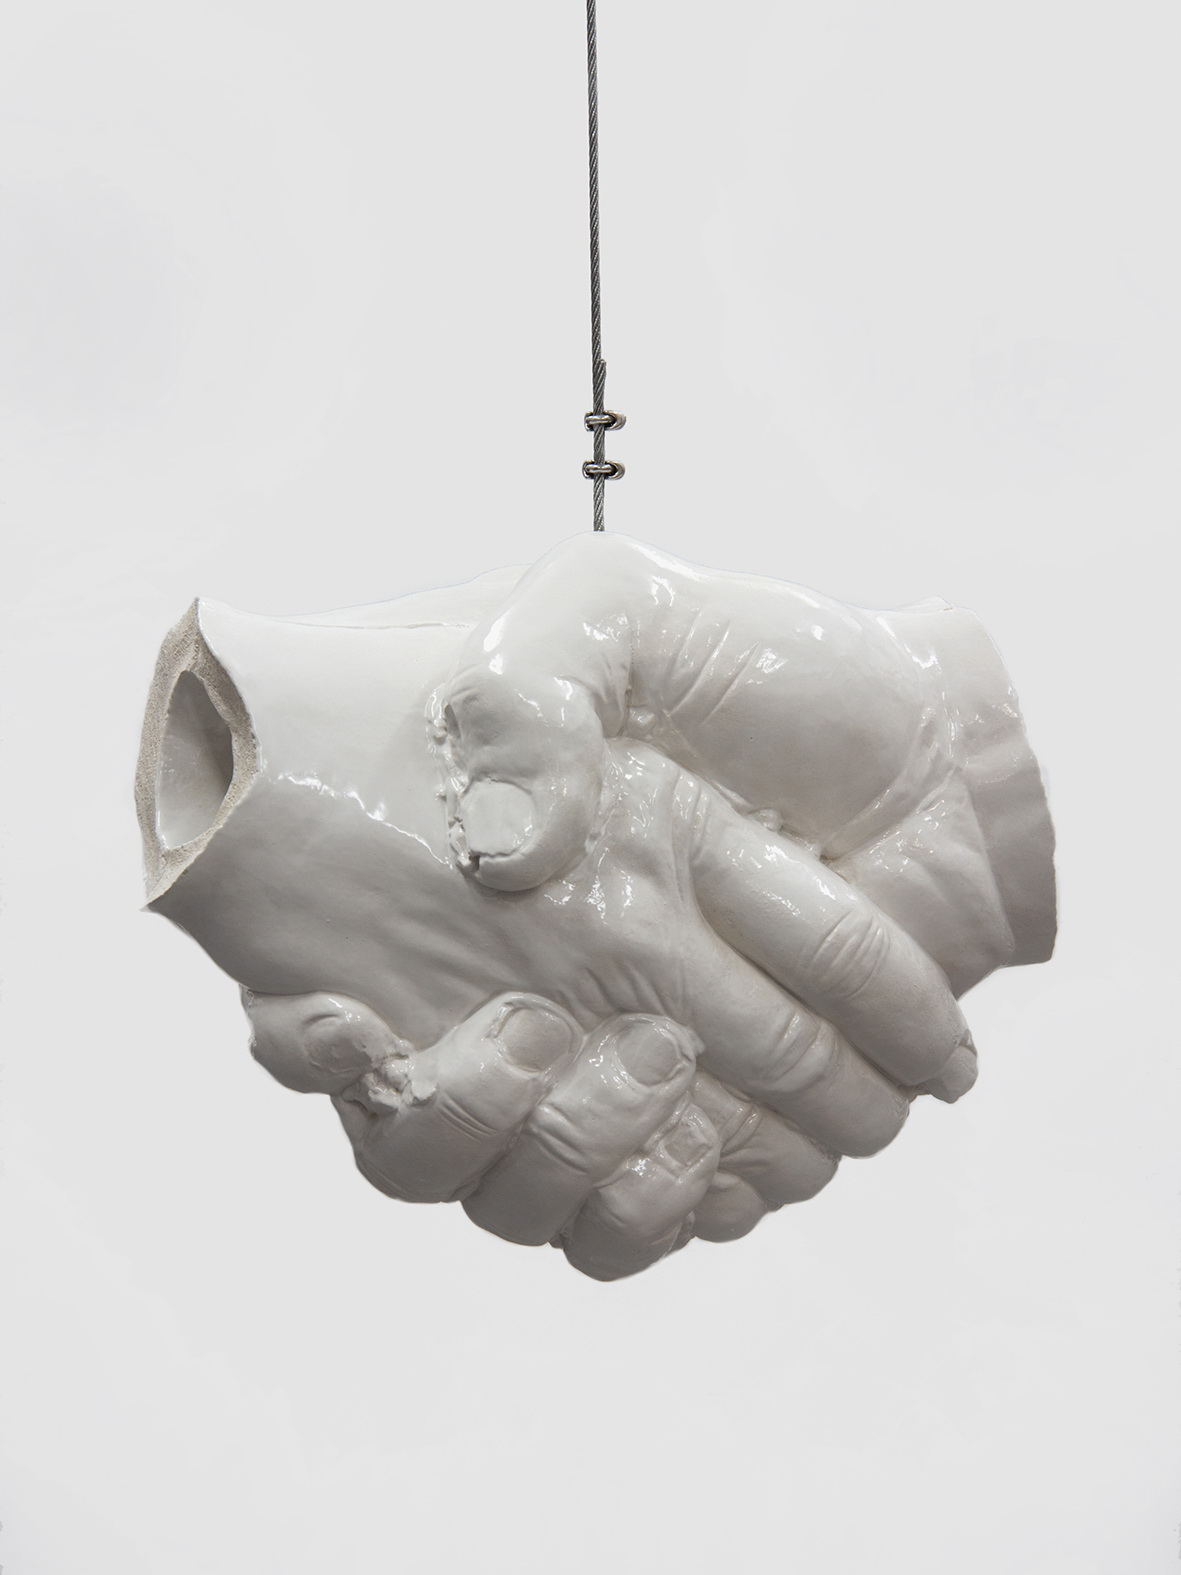 Ceramic Sculpture I Handschlag I Erik Andersen